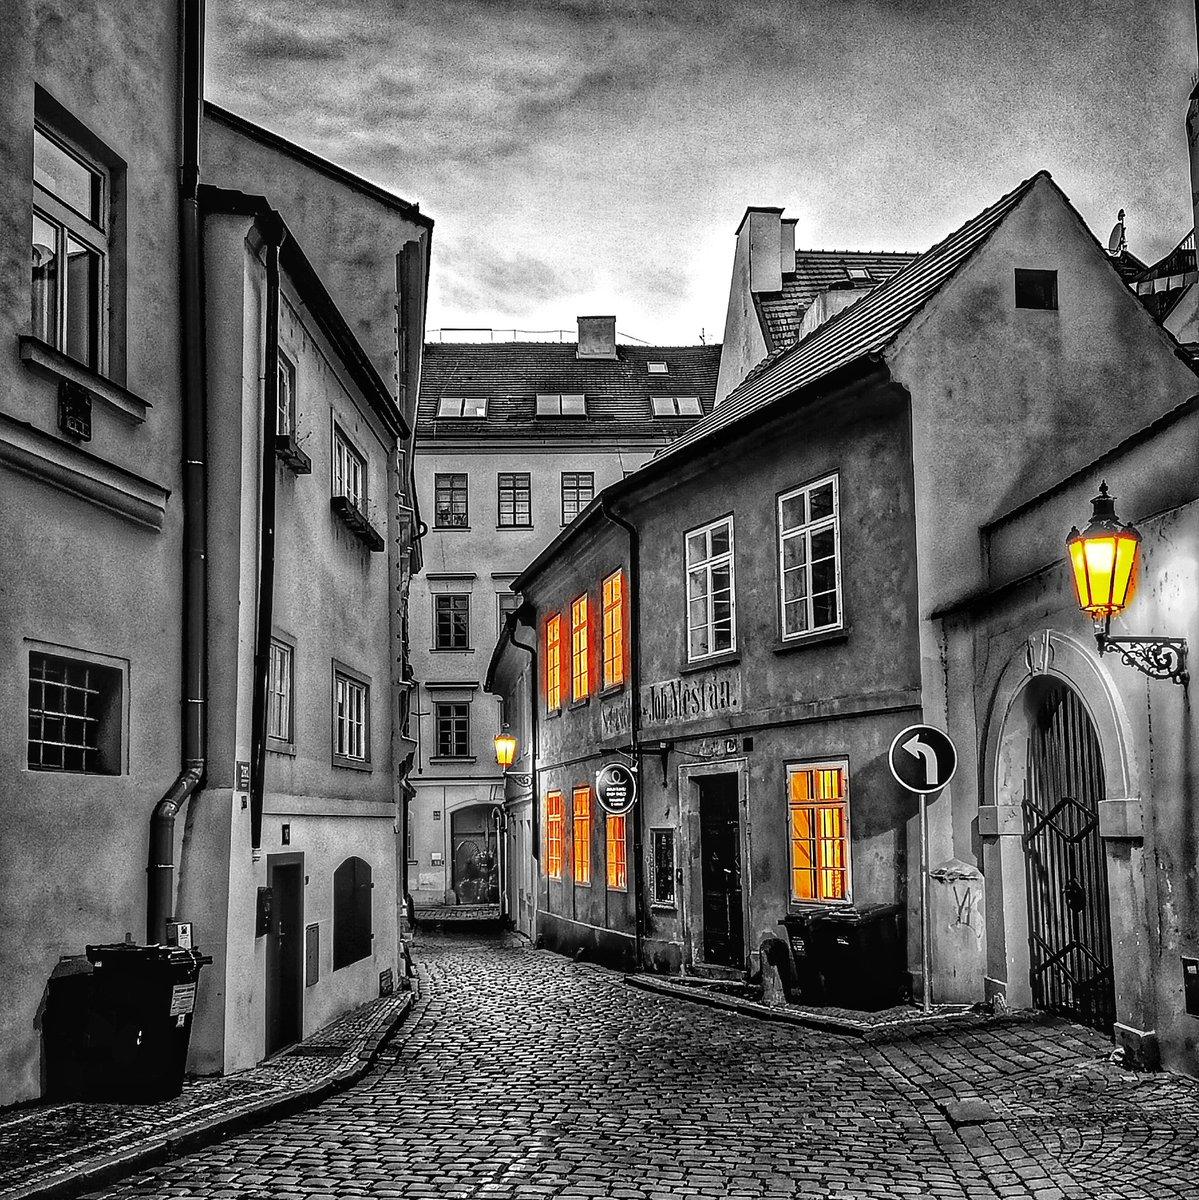 P R A H A  #prague #praha #czechrepublic #ceskarepublika #streets #blackandwhitephotography